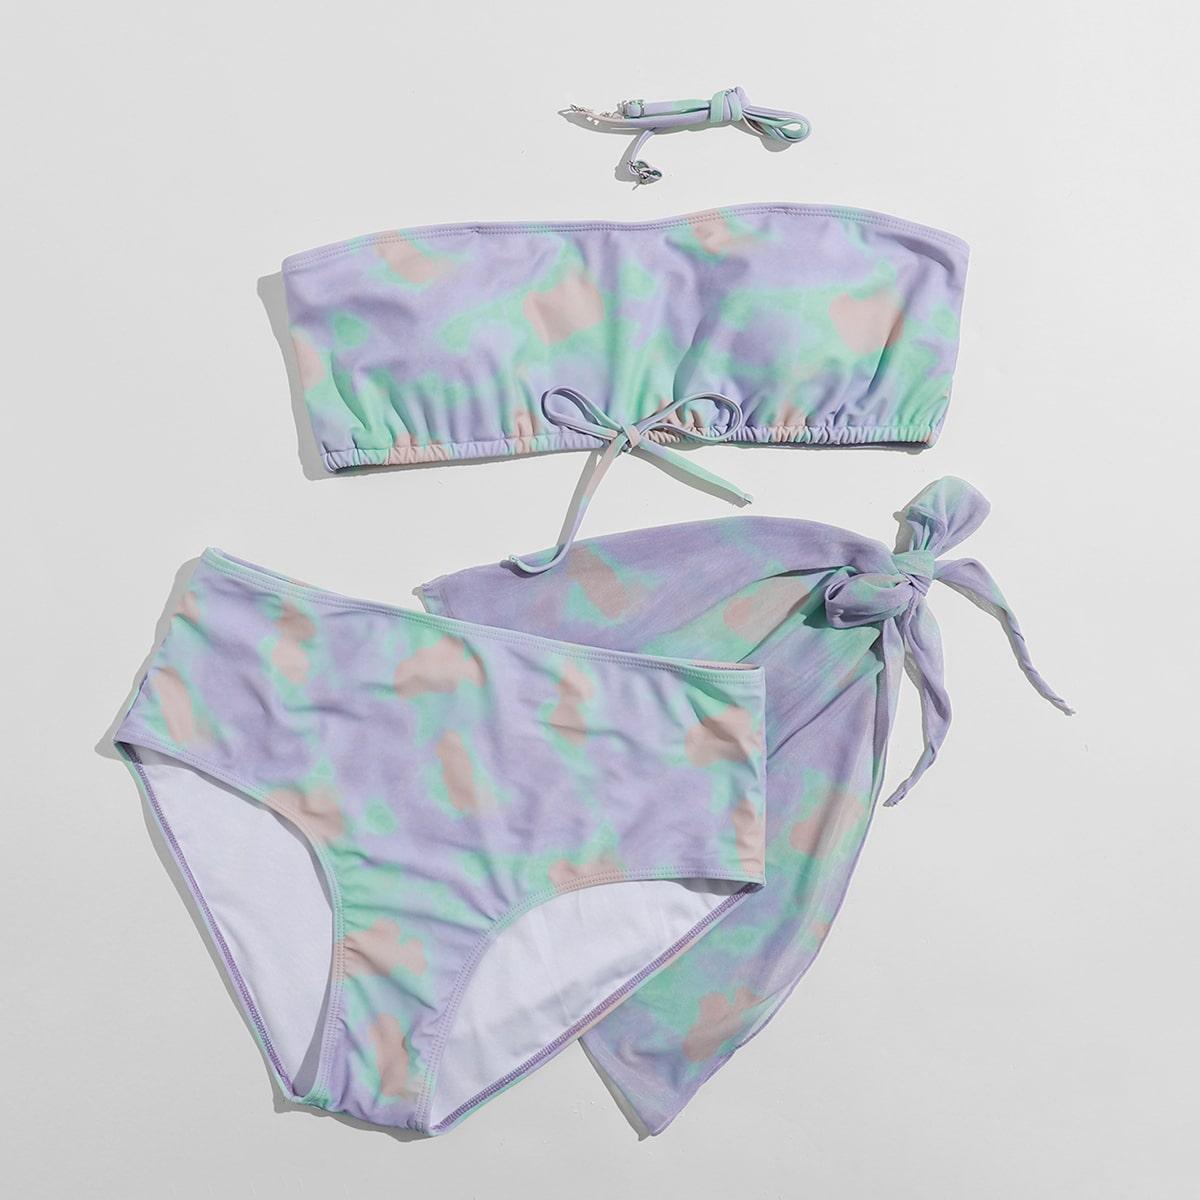 SHEIN / 3pack Plus Tie Dye Bandeau Bikini Swimsuit & Beach Skirt